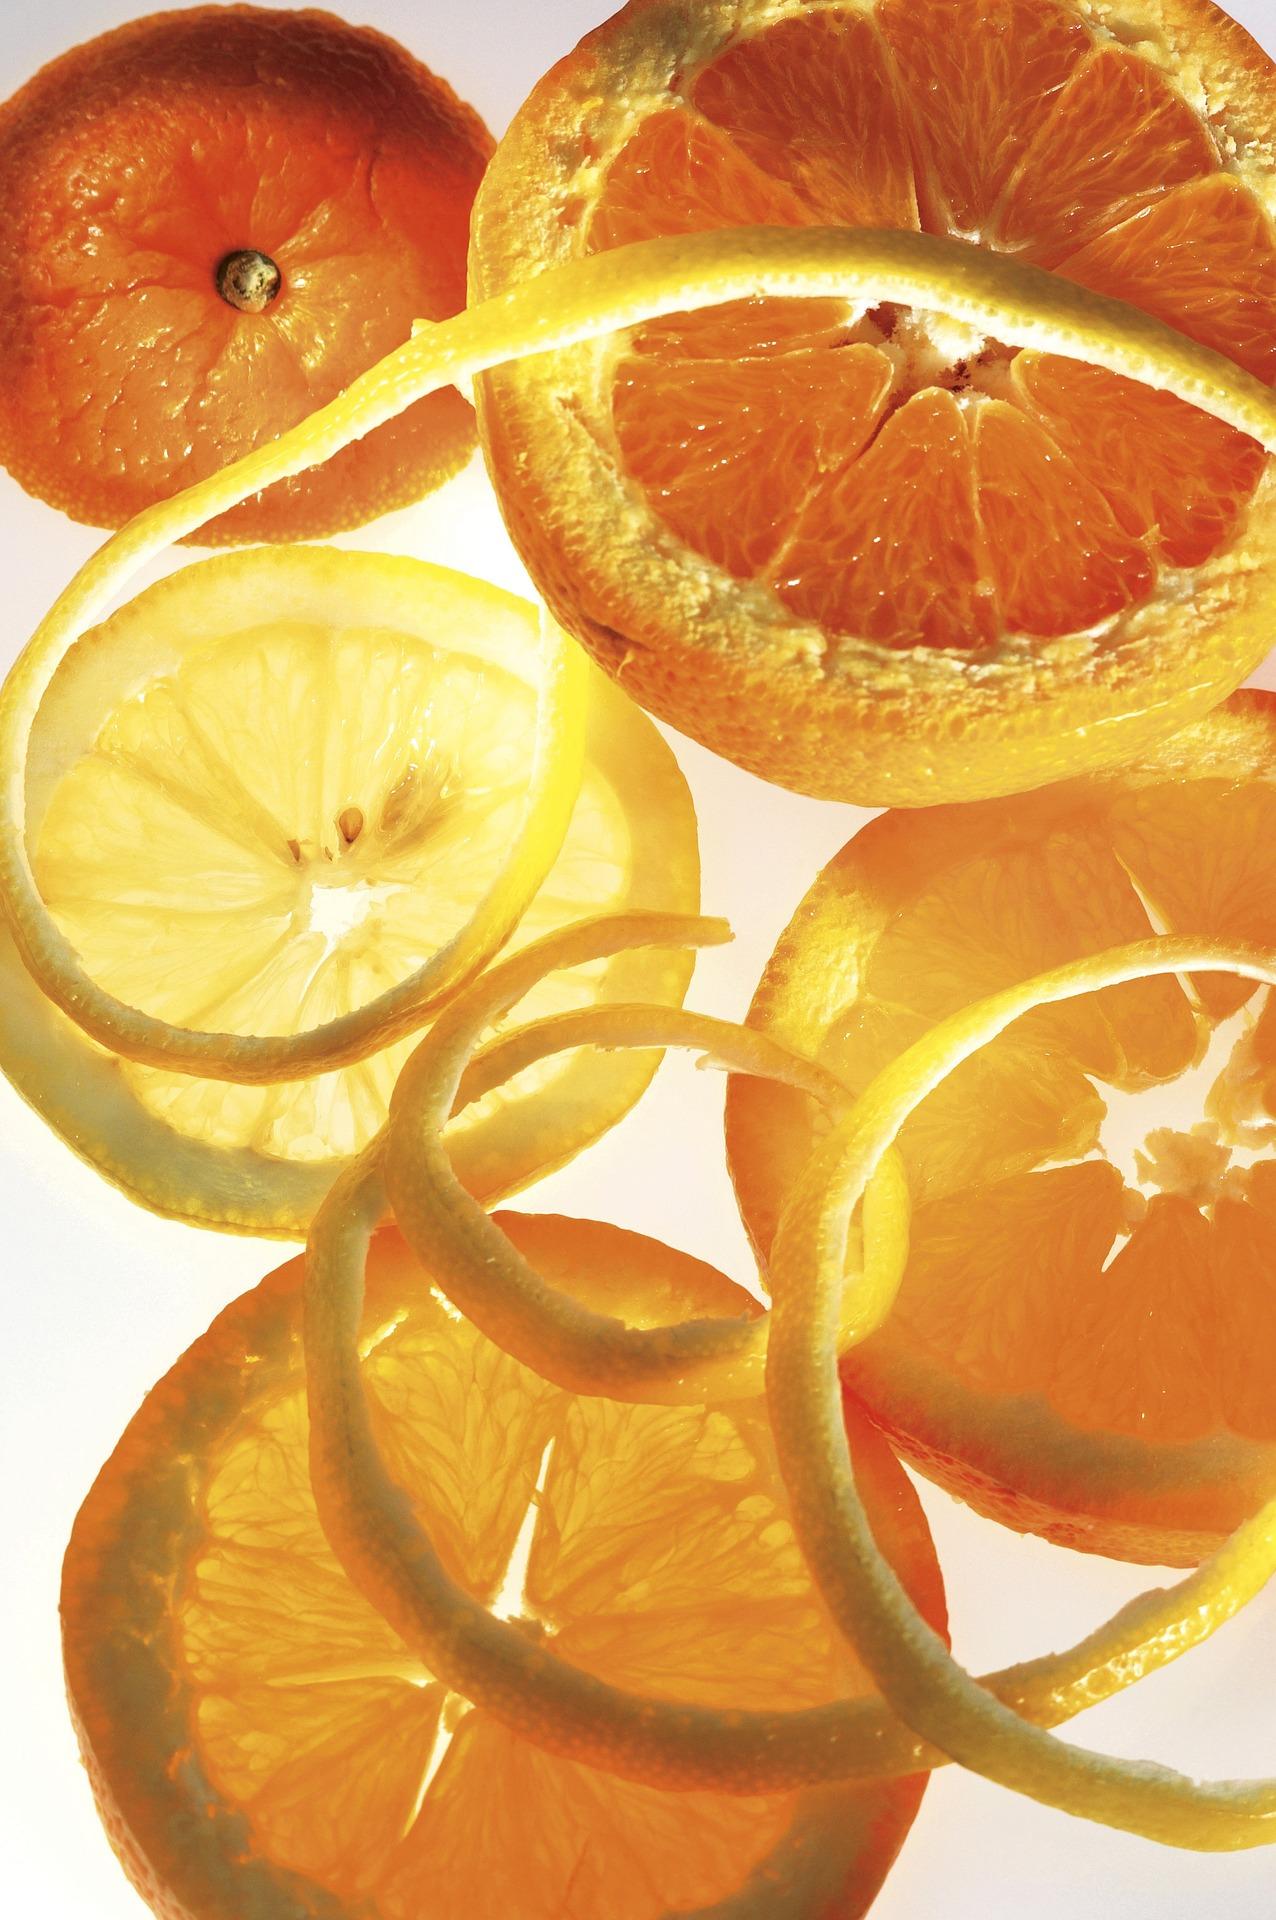 Boil Some Orange Peels